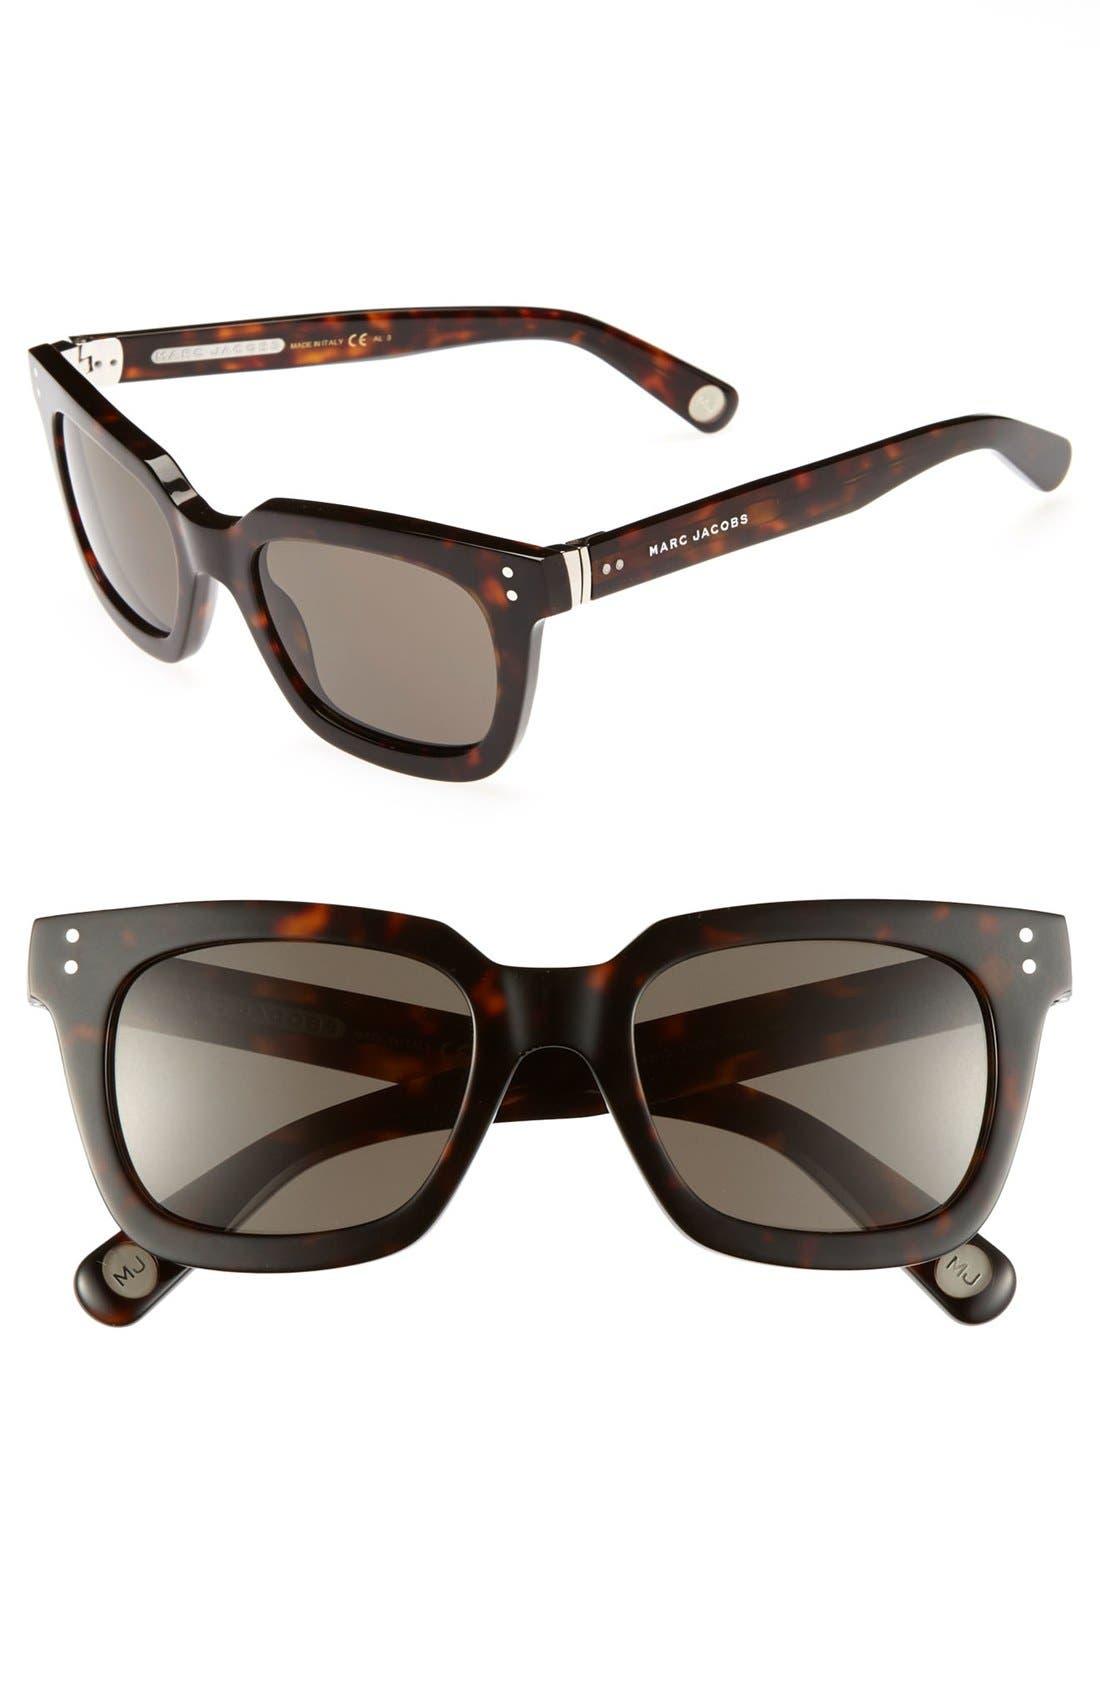 Main Image - MARC JACOBS 50mm Retro Sunglasses